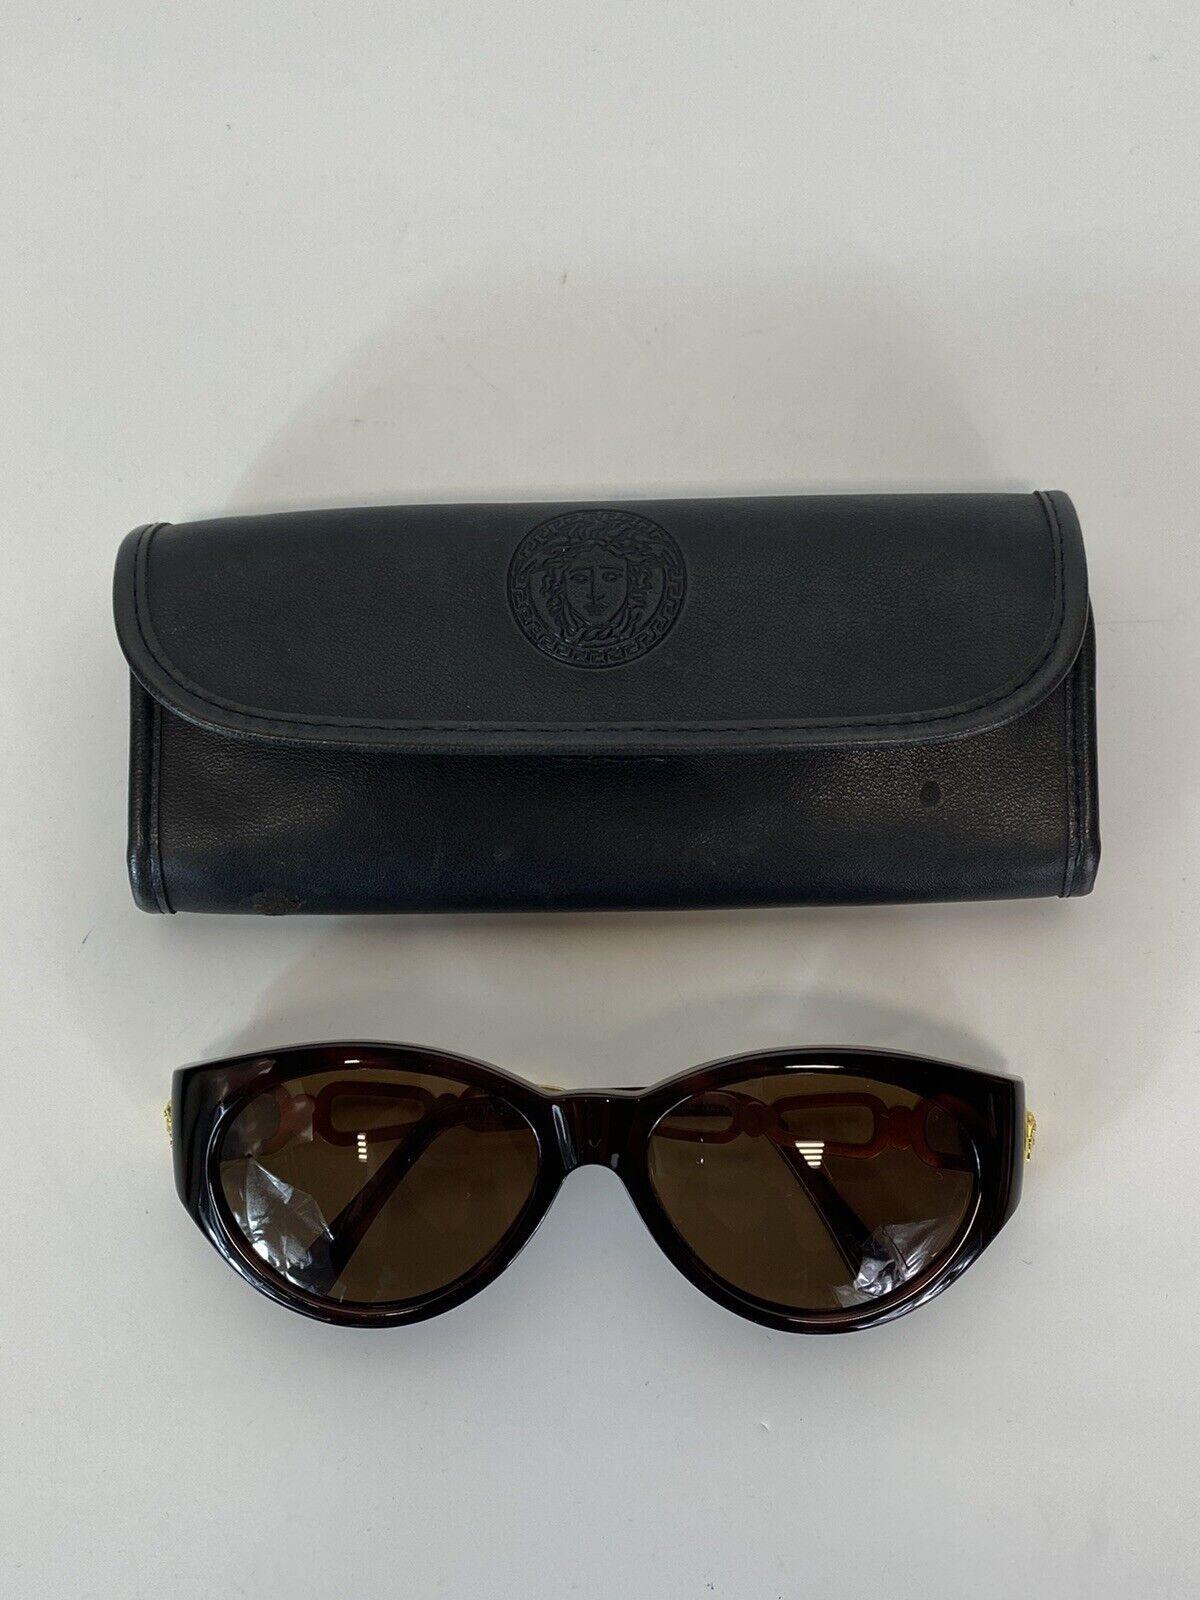 Rare Vtg Gianni Versace Brown Gold Medusa Sunglas… - image 7